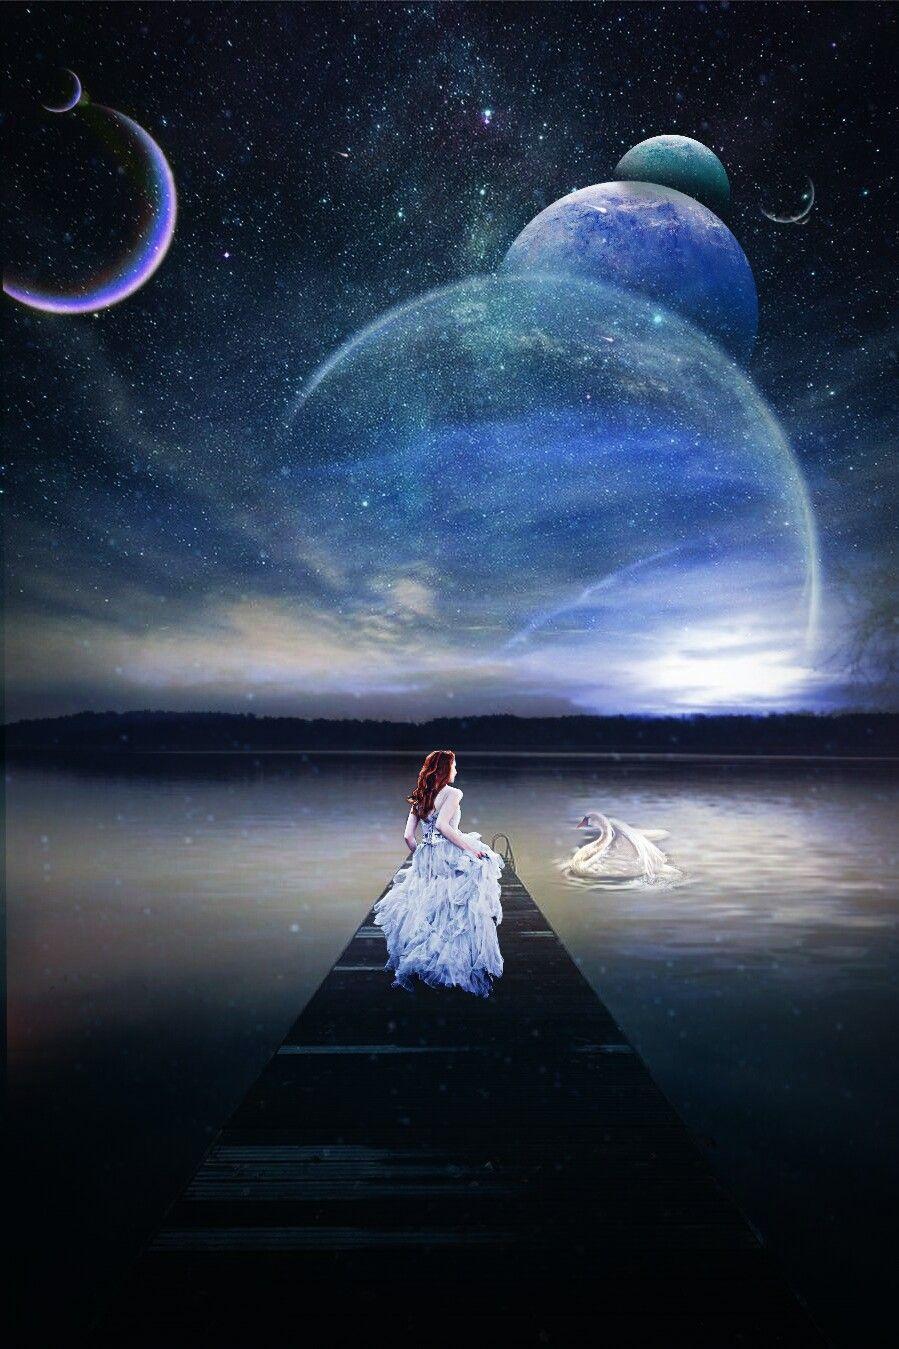 #freetoedit #landscape #surreal #girl #walk #night #galaxy #planets #moon #swan #fantasy #lake #stars